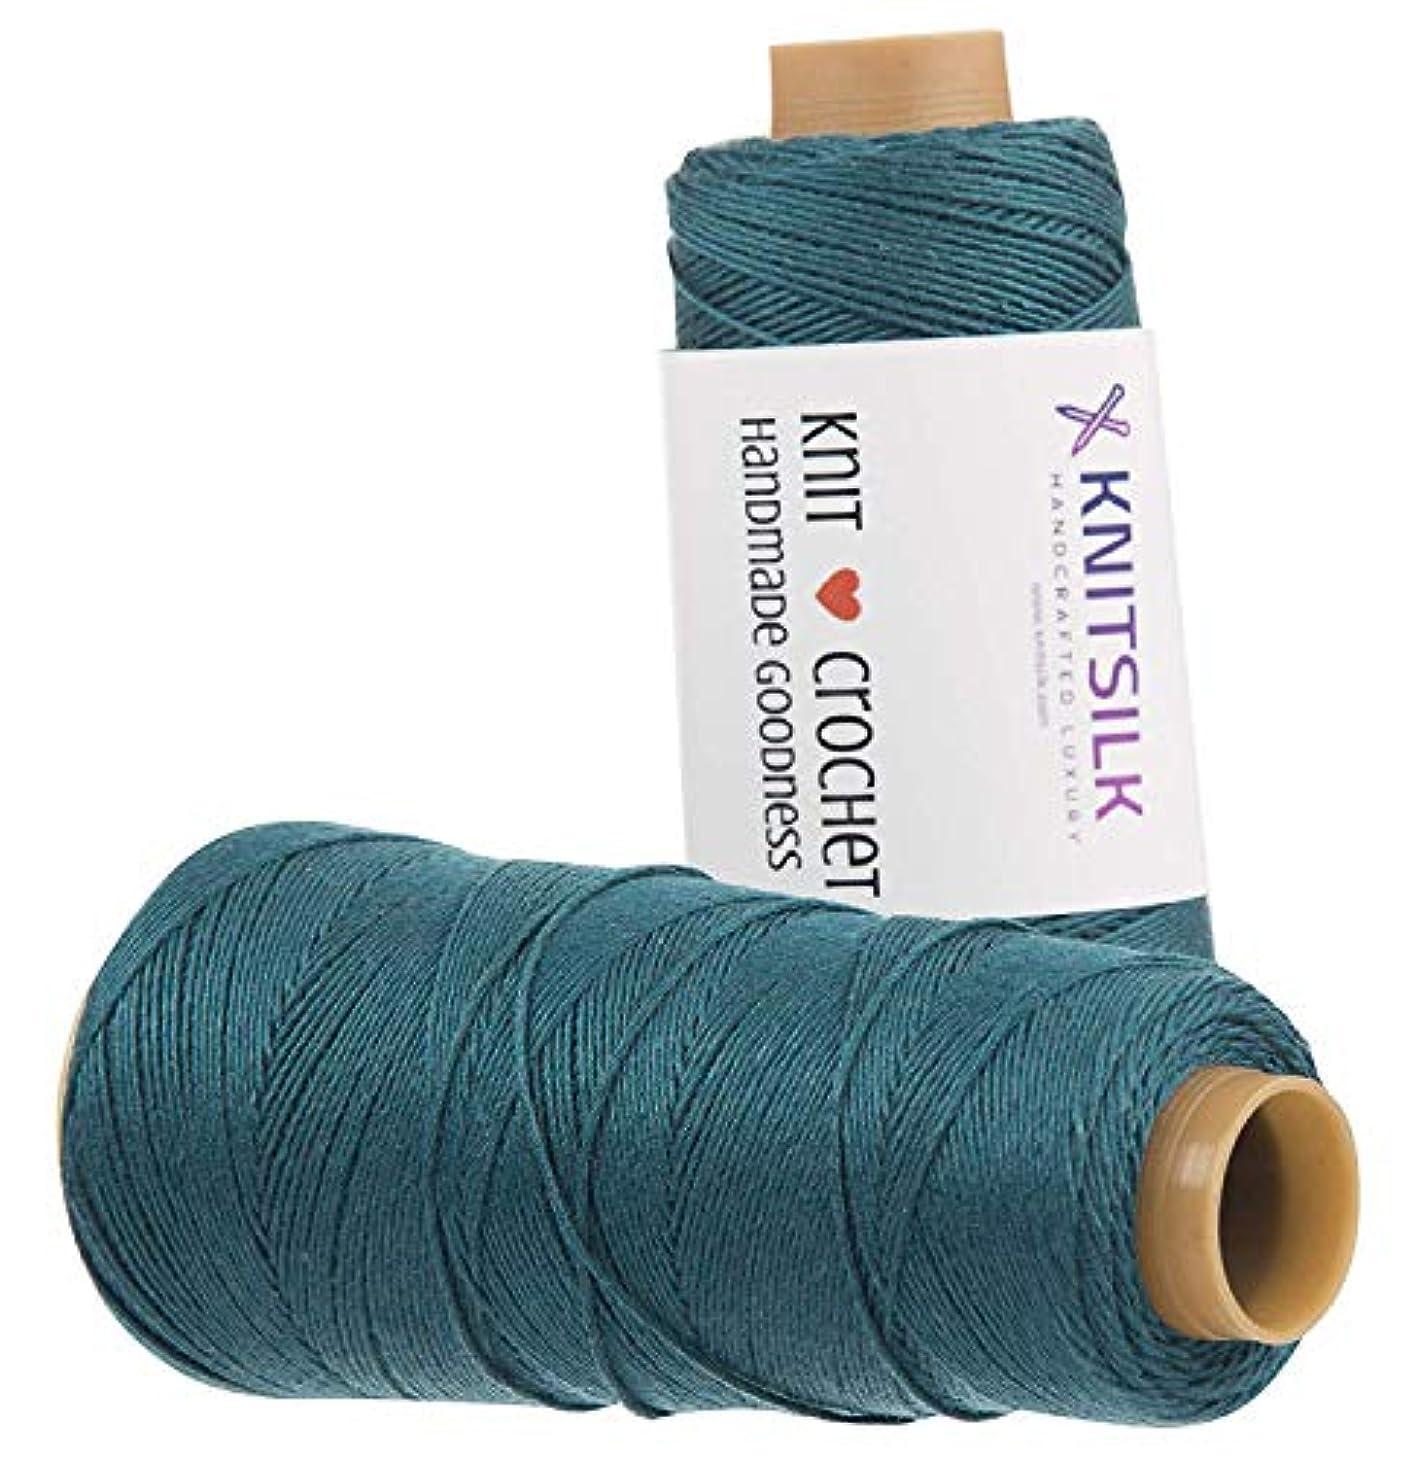 KnitSilk Pure Silk Viscose Blend Yarn in Cones - Knit, Crochet, Weave, Tatting, Jewelry, Crafts (8 Ply - 160 Yards, Pack of 1) (Green Pine)